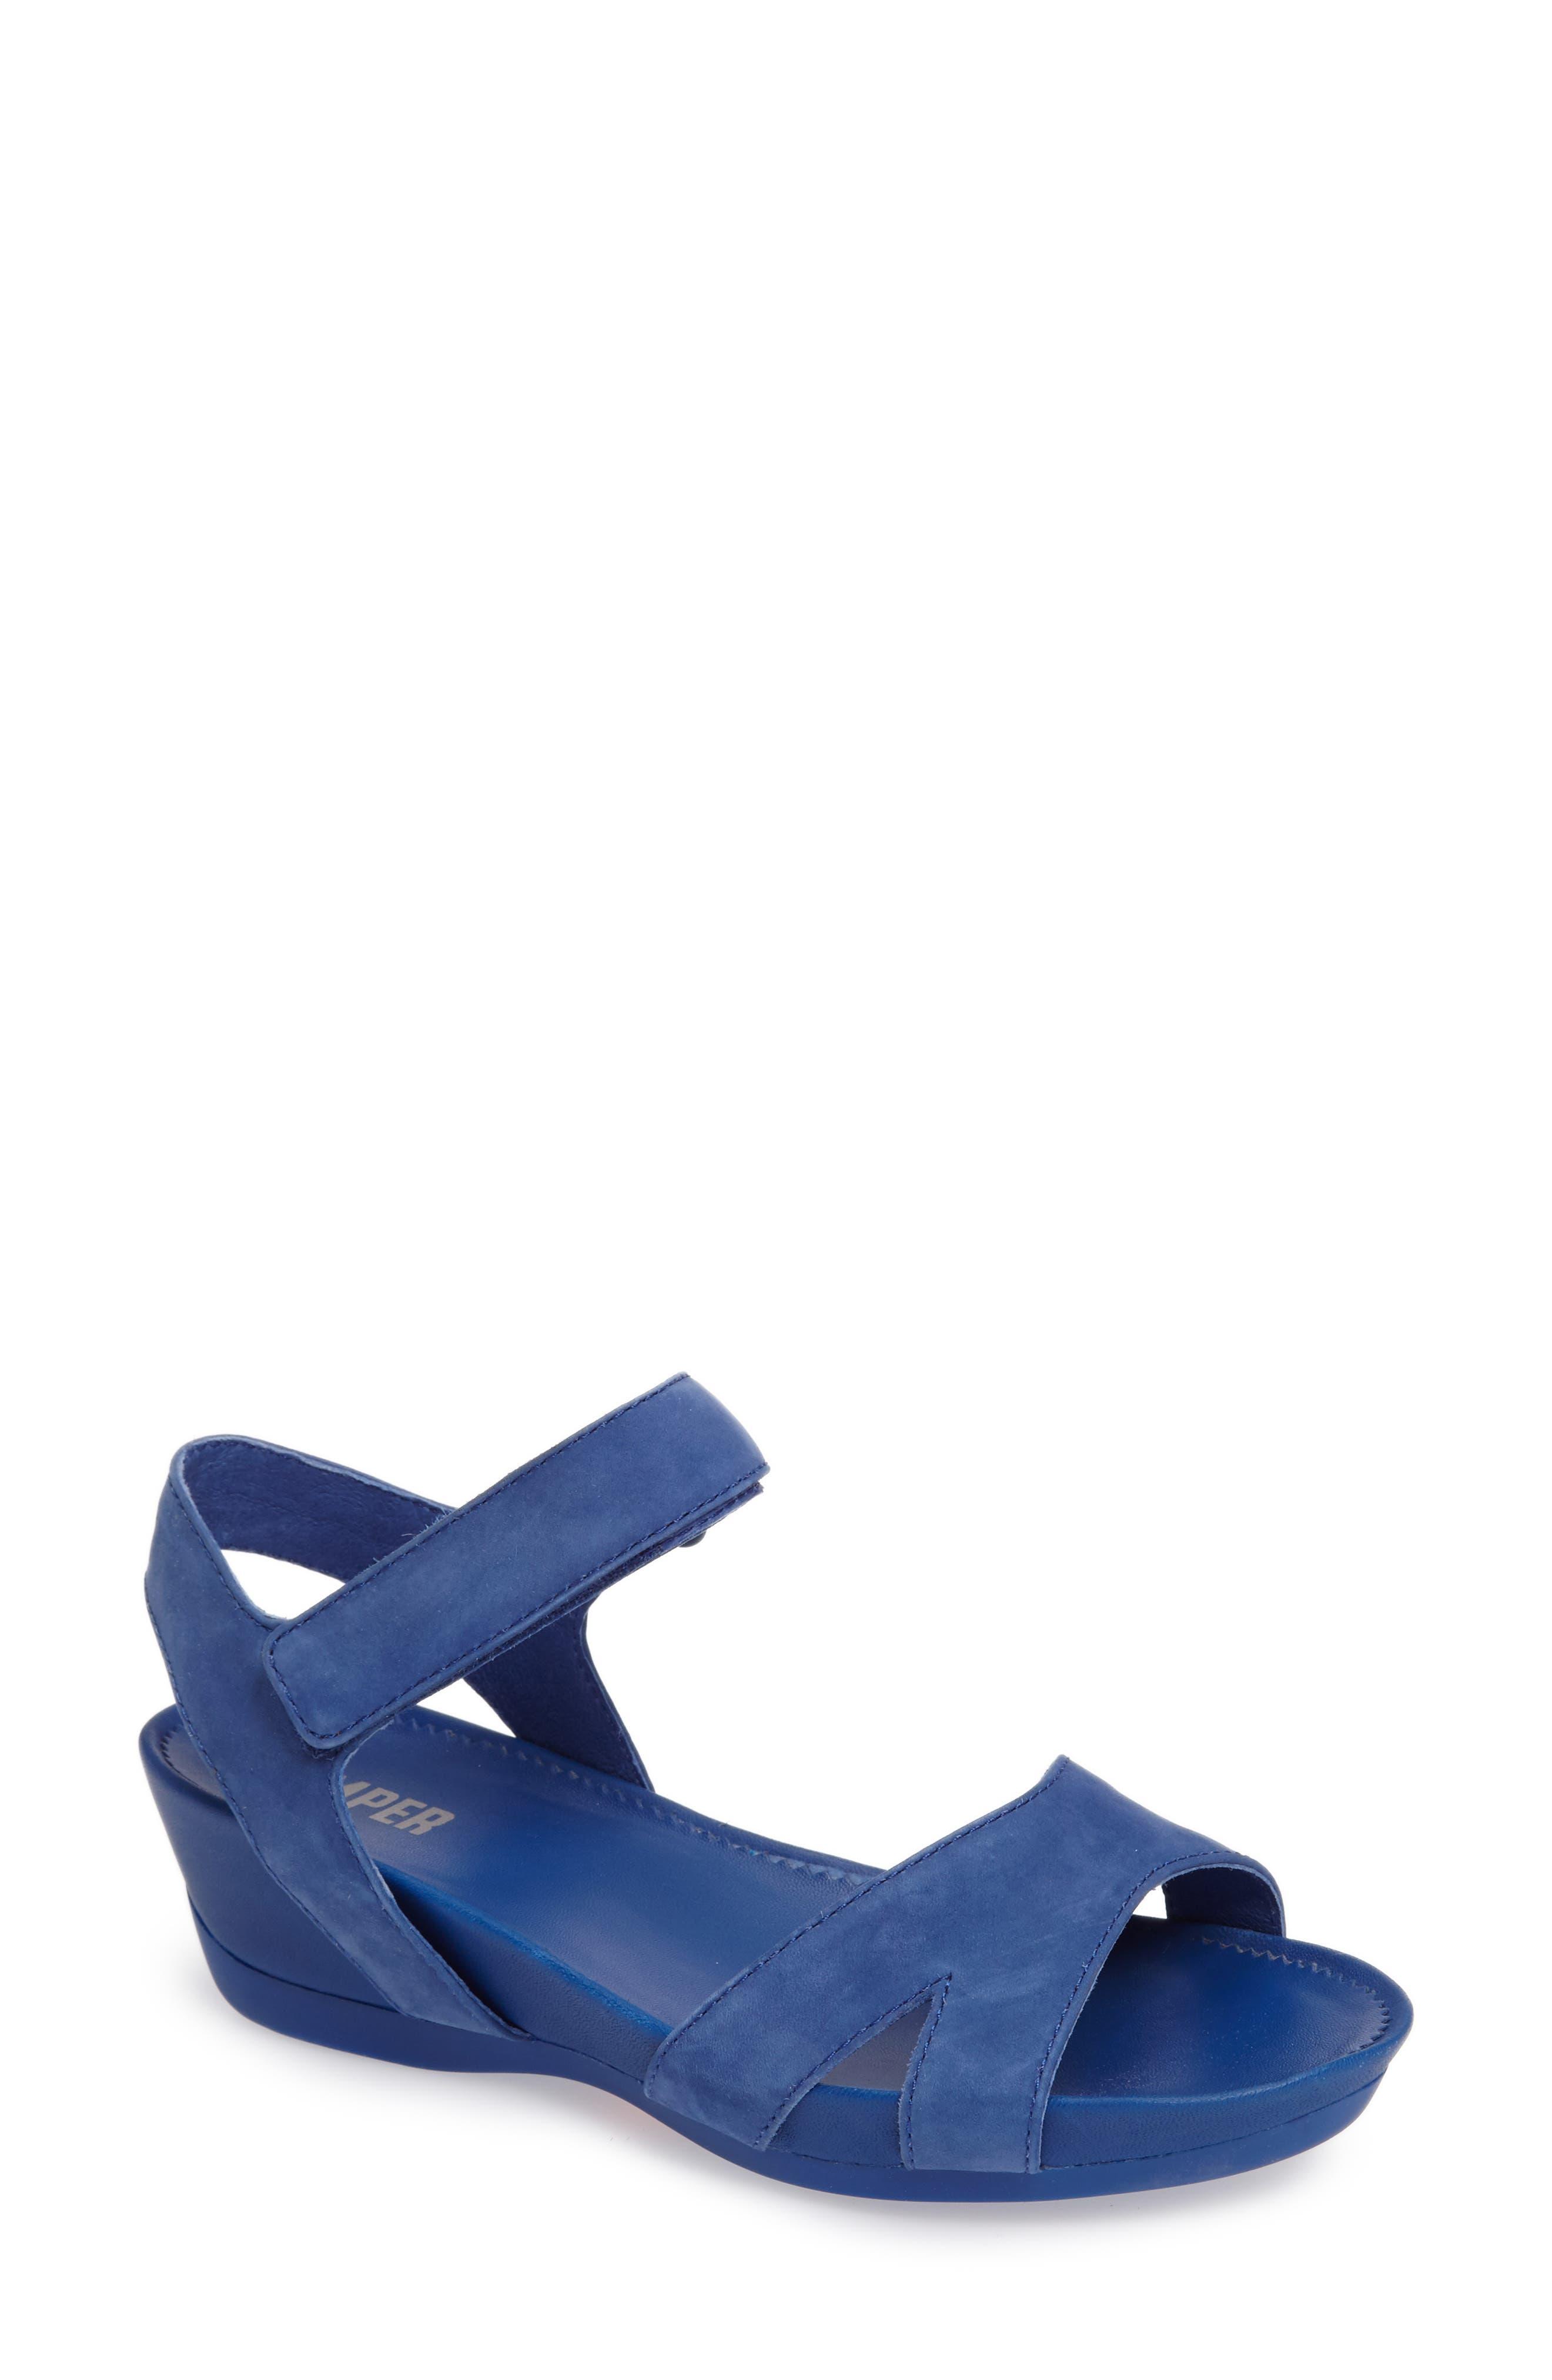 'Micro' Sandal,                         Main,                         color, Blue Leather